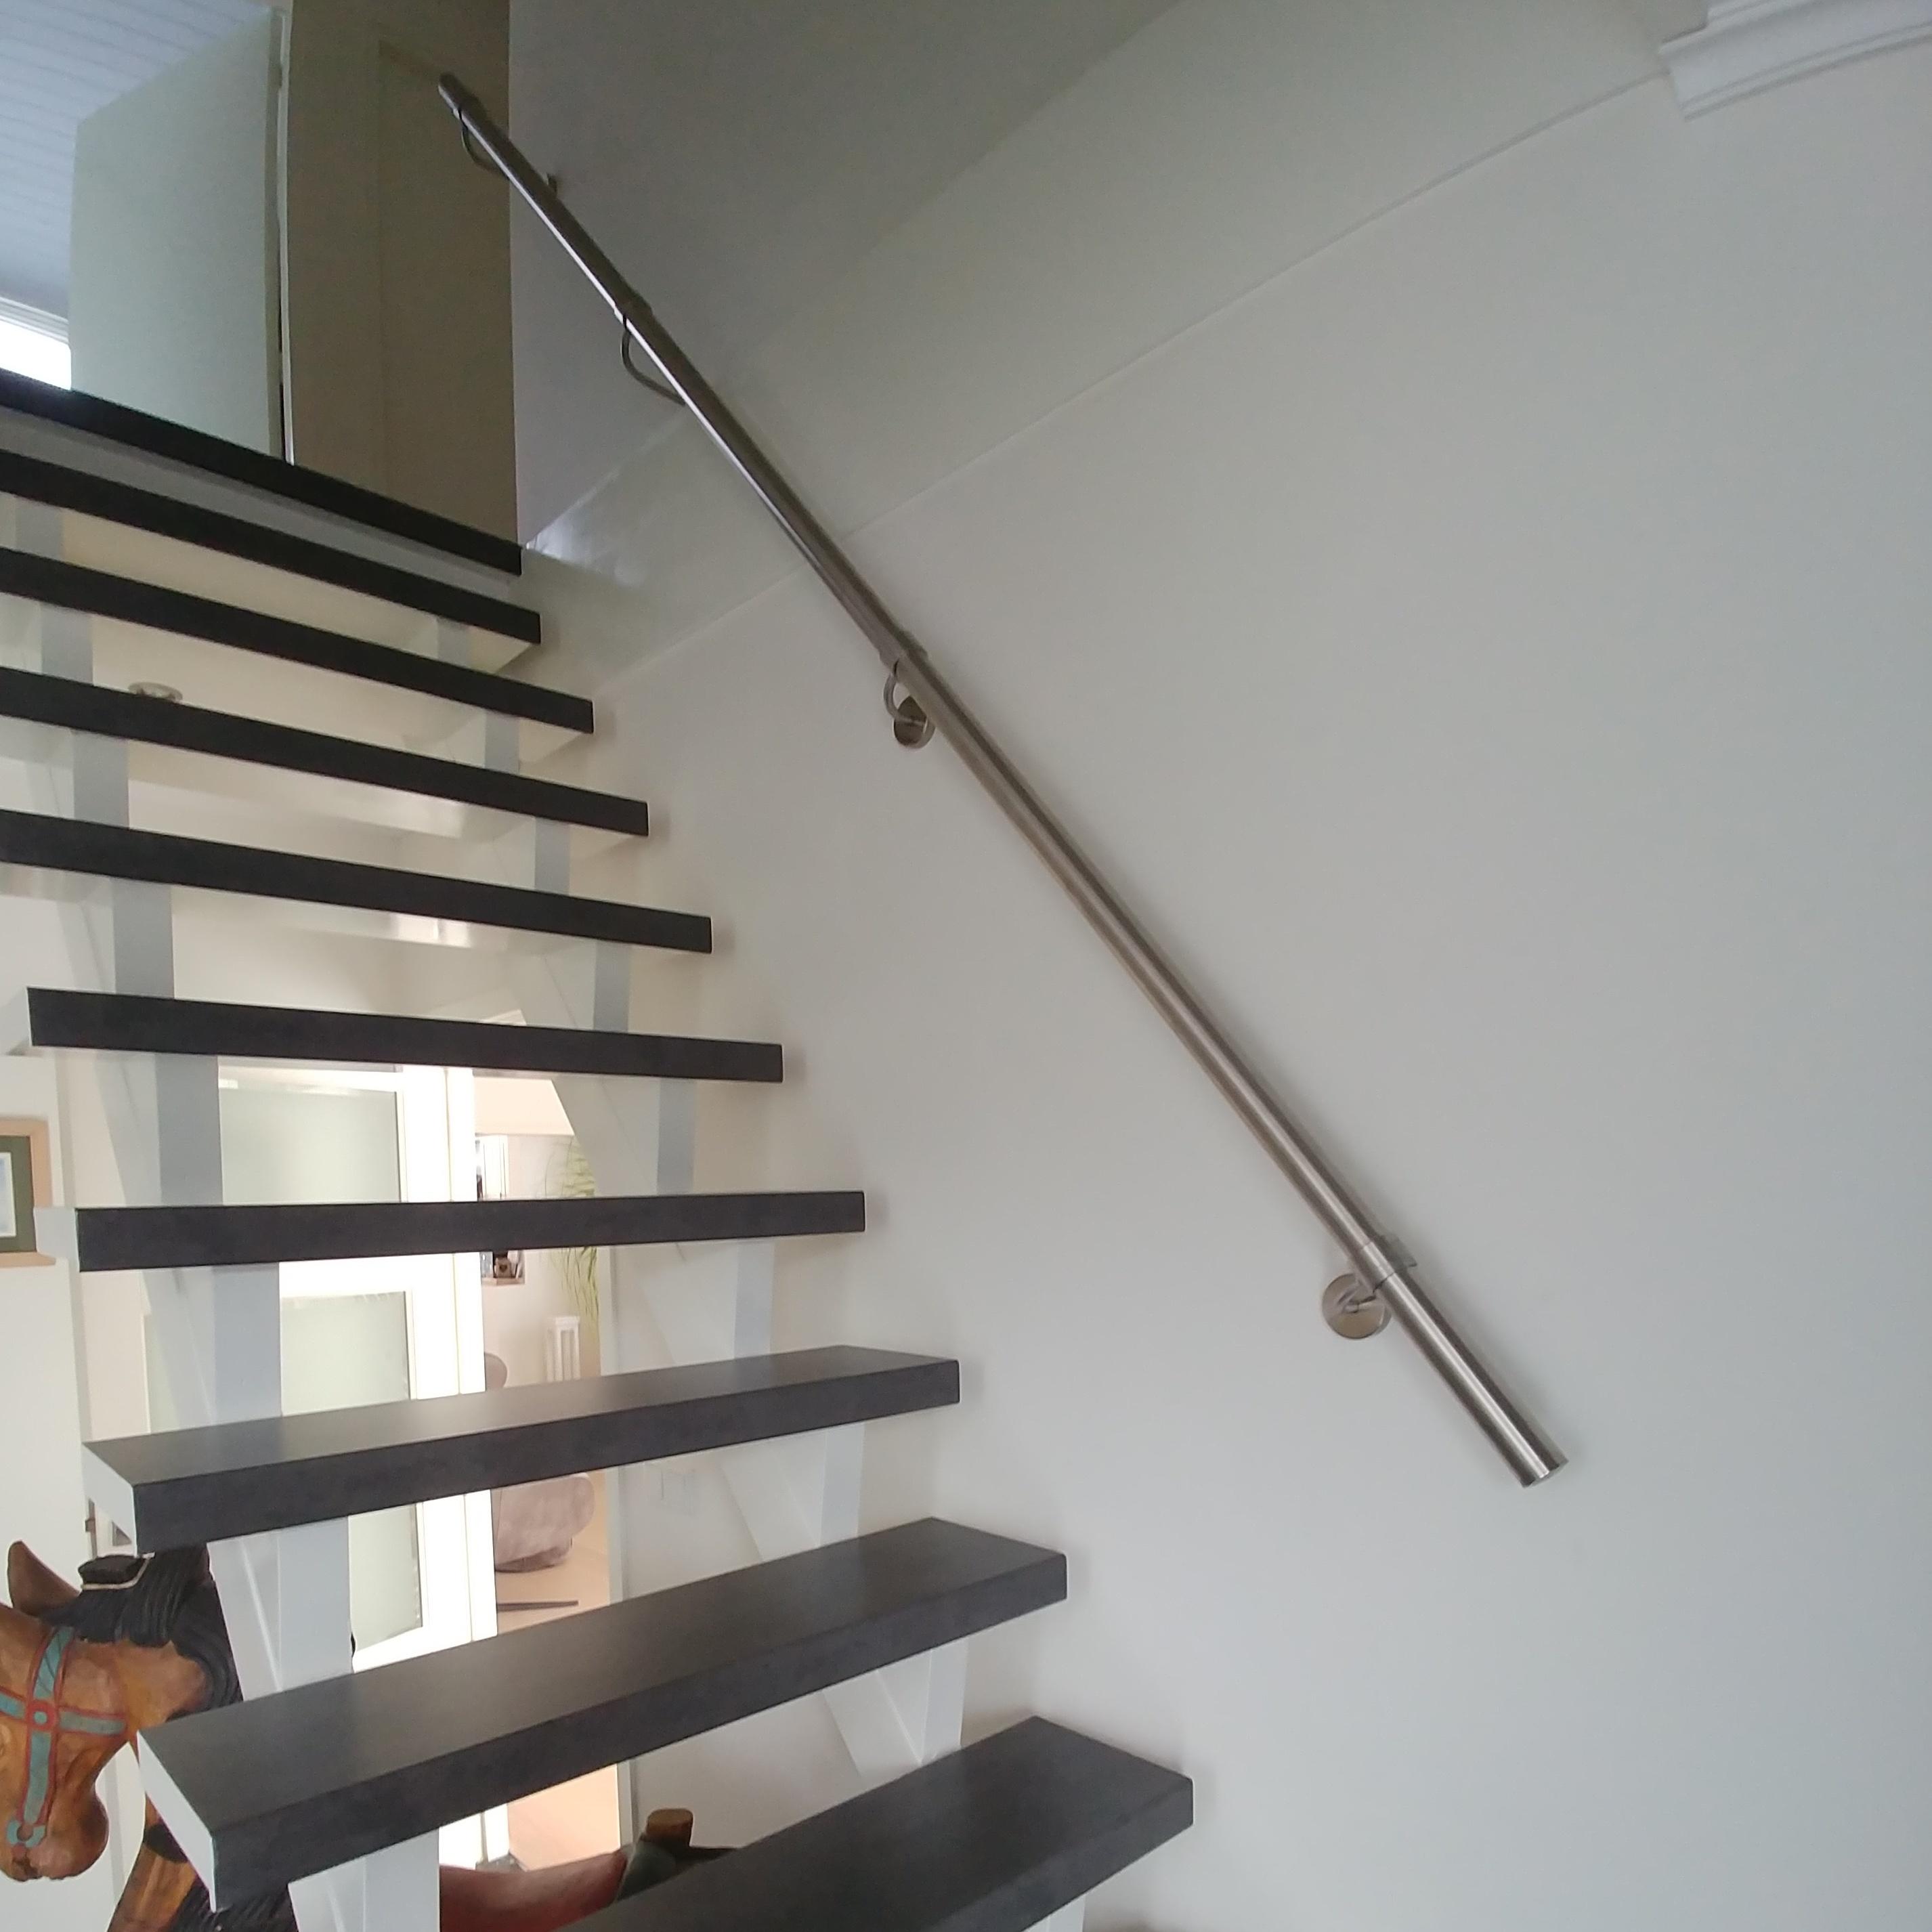 Handlauf Edelstahl rund gebürstet Modell 9 - Runde Edelstahl Treppengeländer - Treppenhandlauf